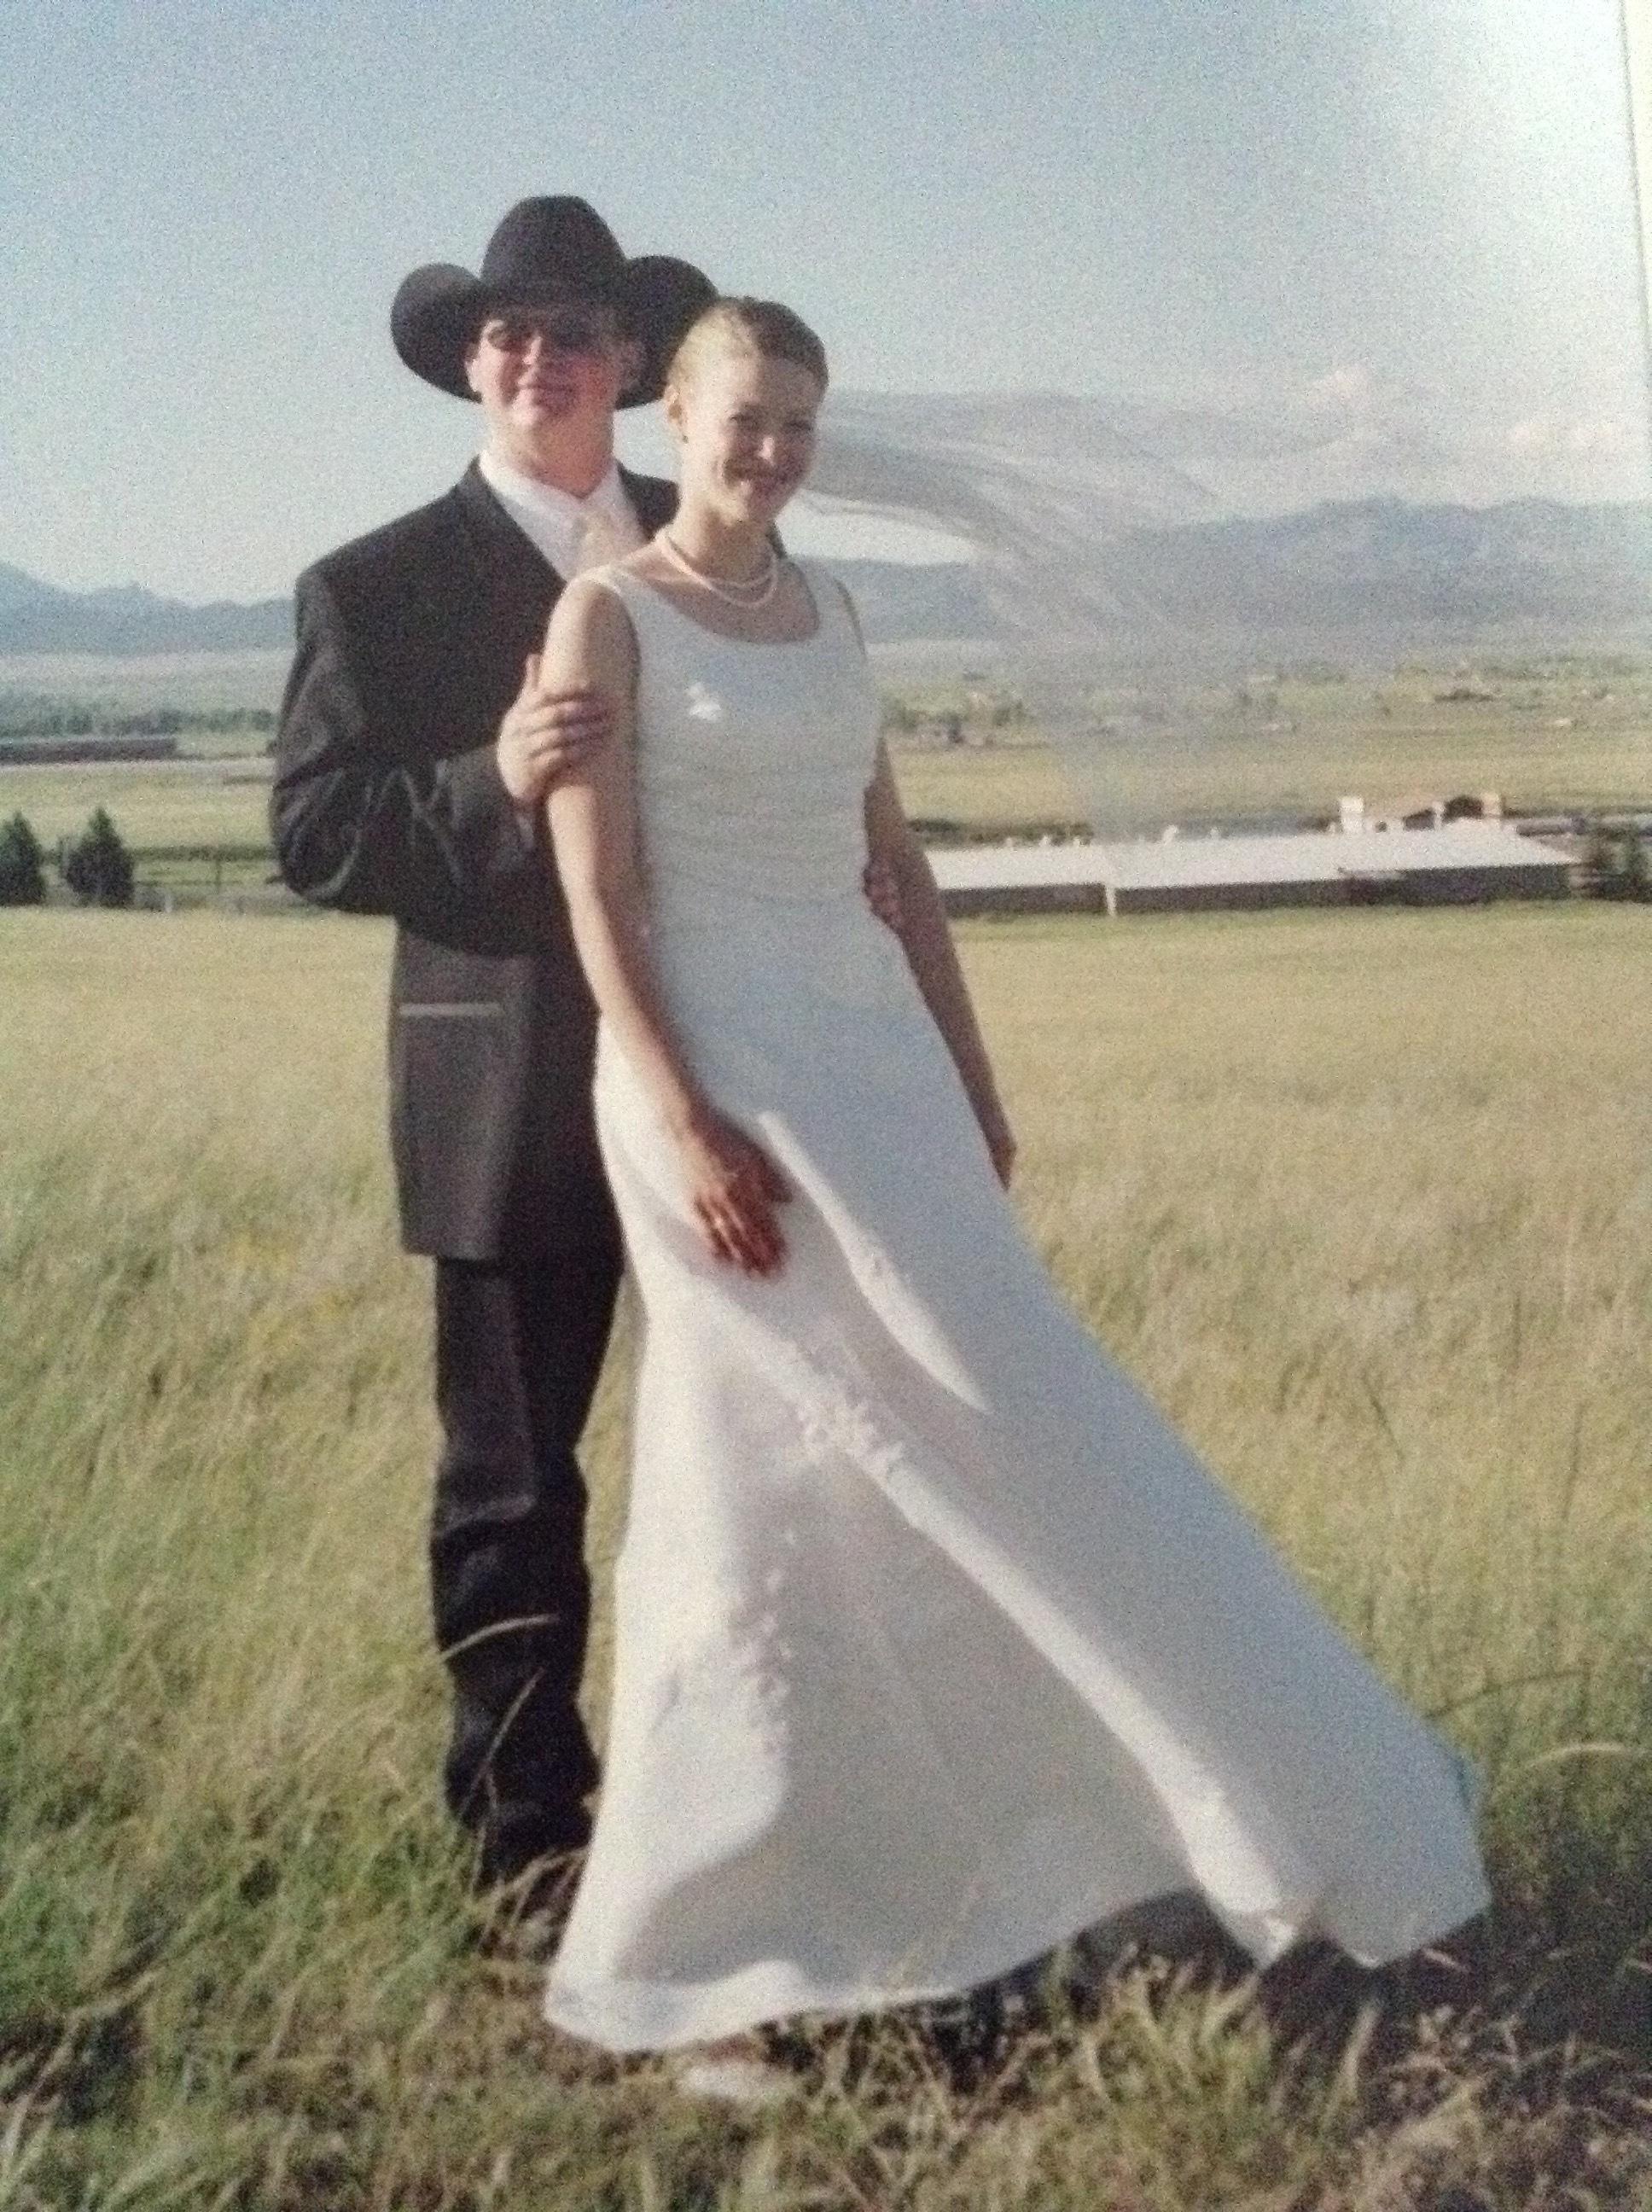 Wedding day, June 2002